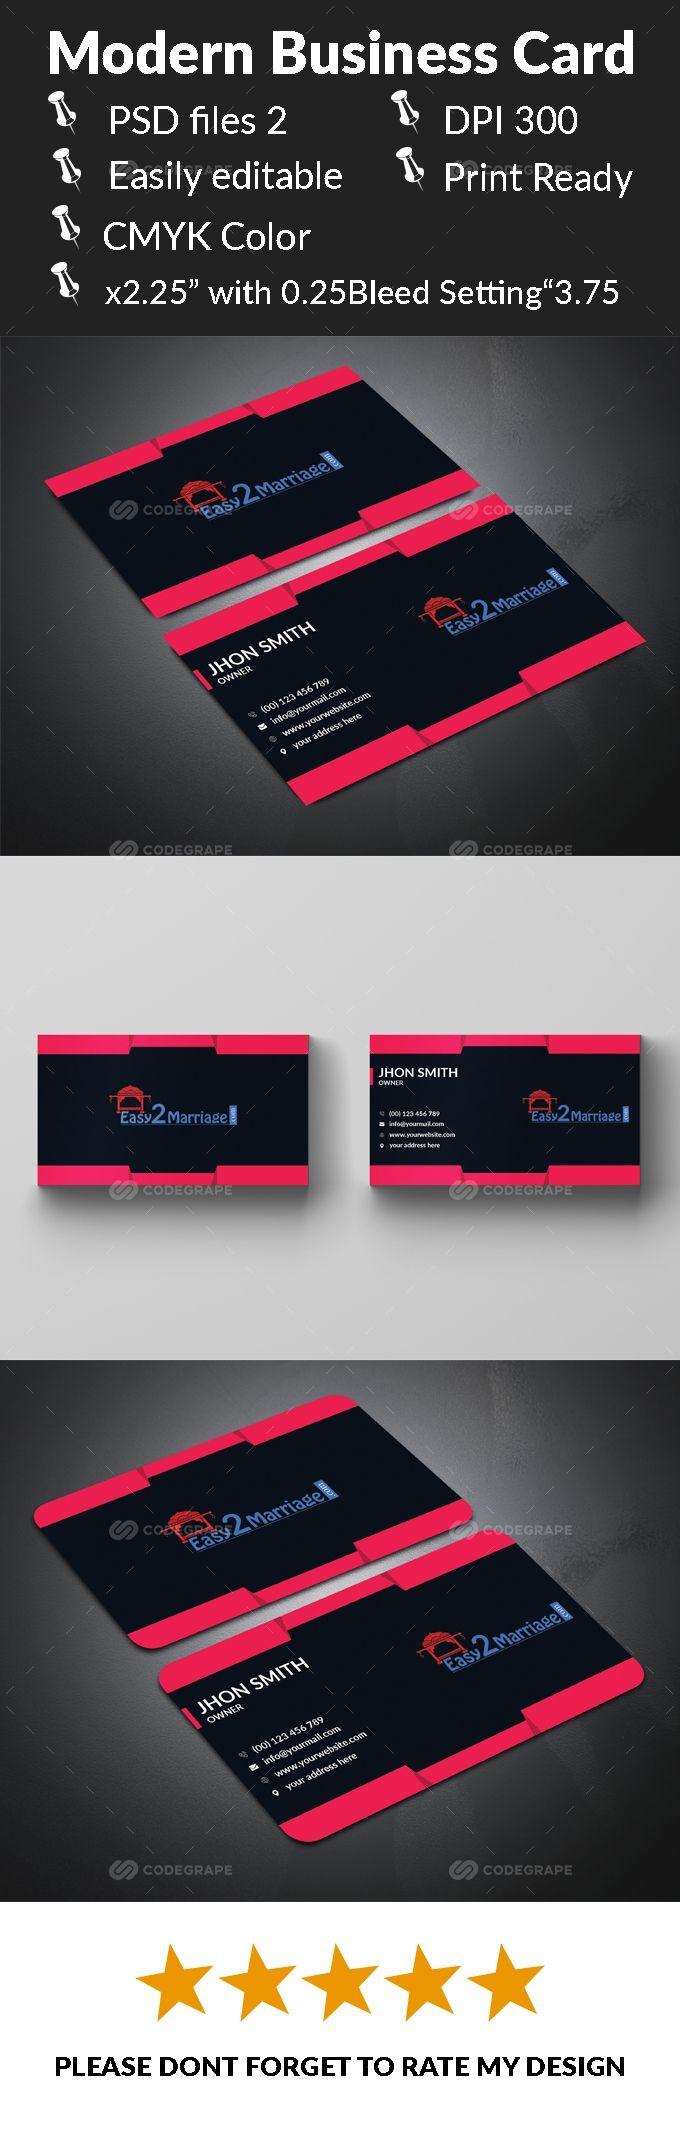 Modern Business Card Modern Business Cards Business Card Design Card Design